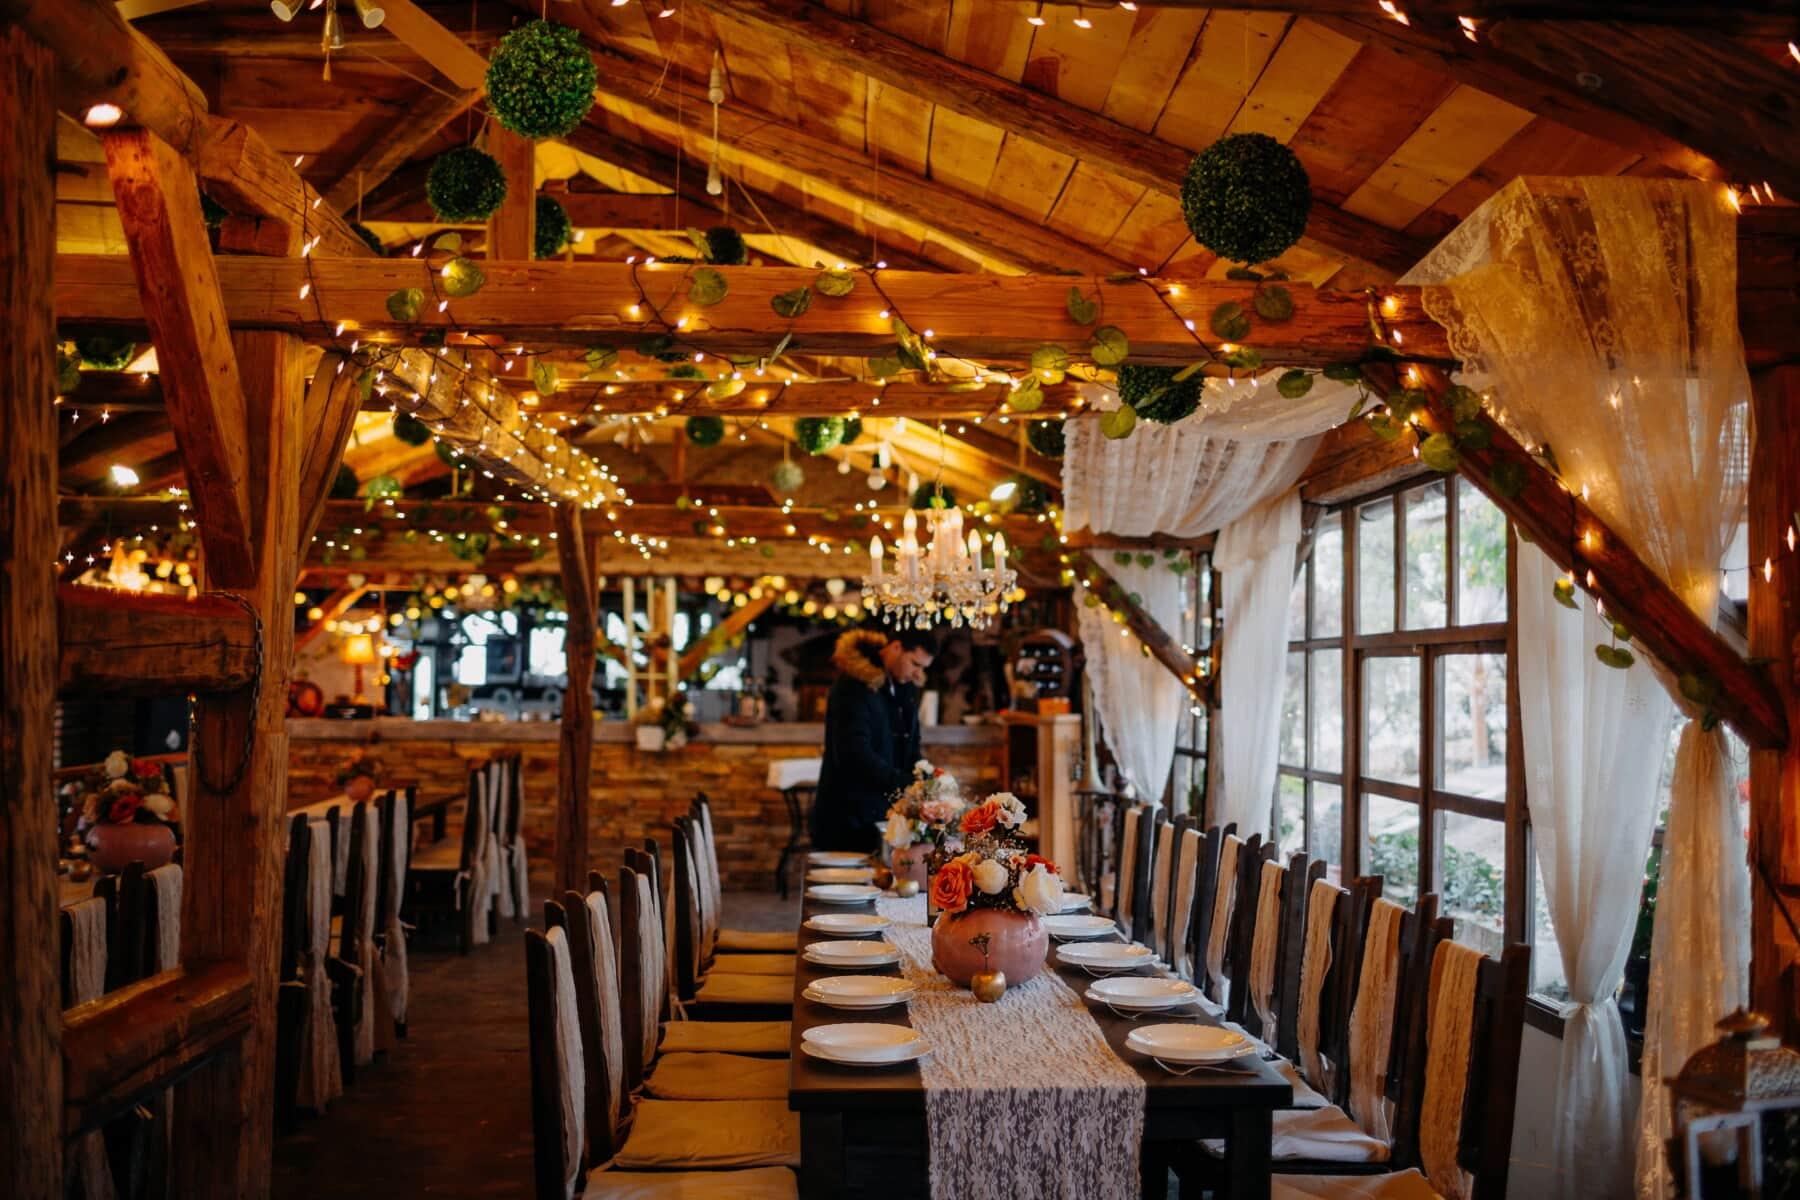 cafeteria, hotel, table, chairs, interior design, interior, architecture, restaurant, indoors, wood